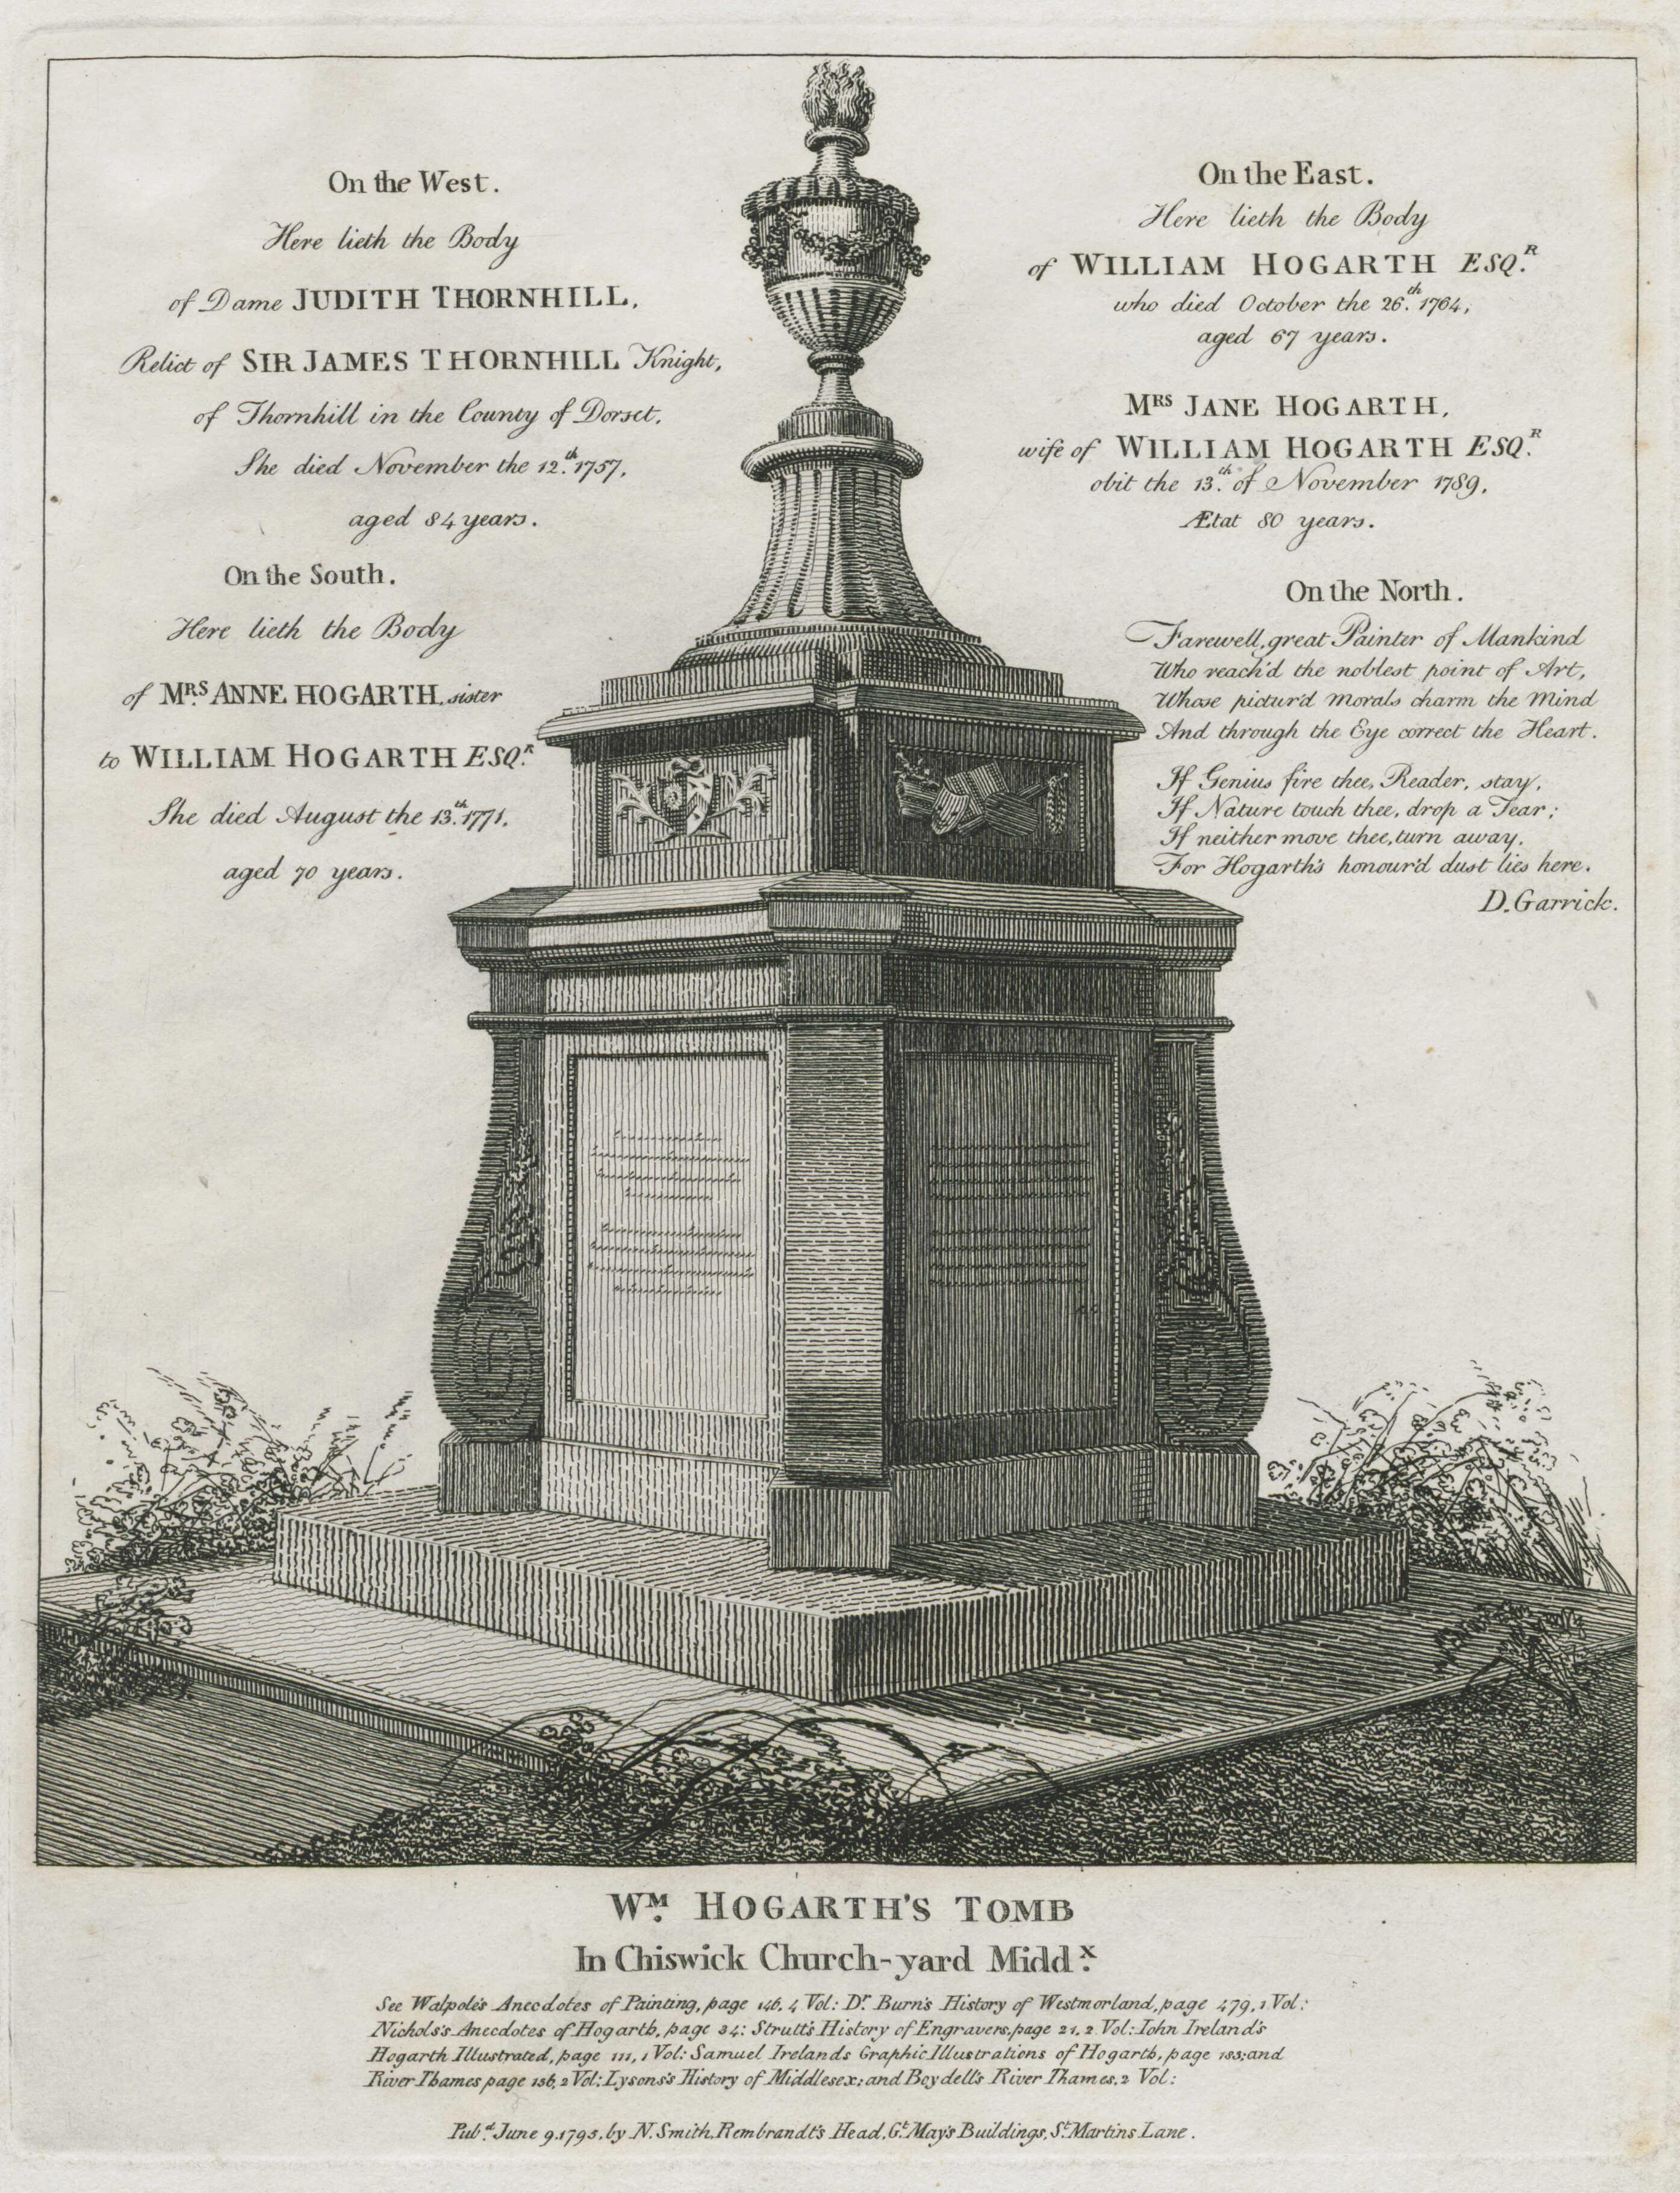 61-wm-hogarths-tomb-in-chiswick-church-yard-middx